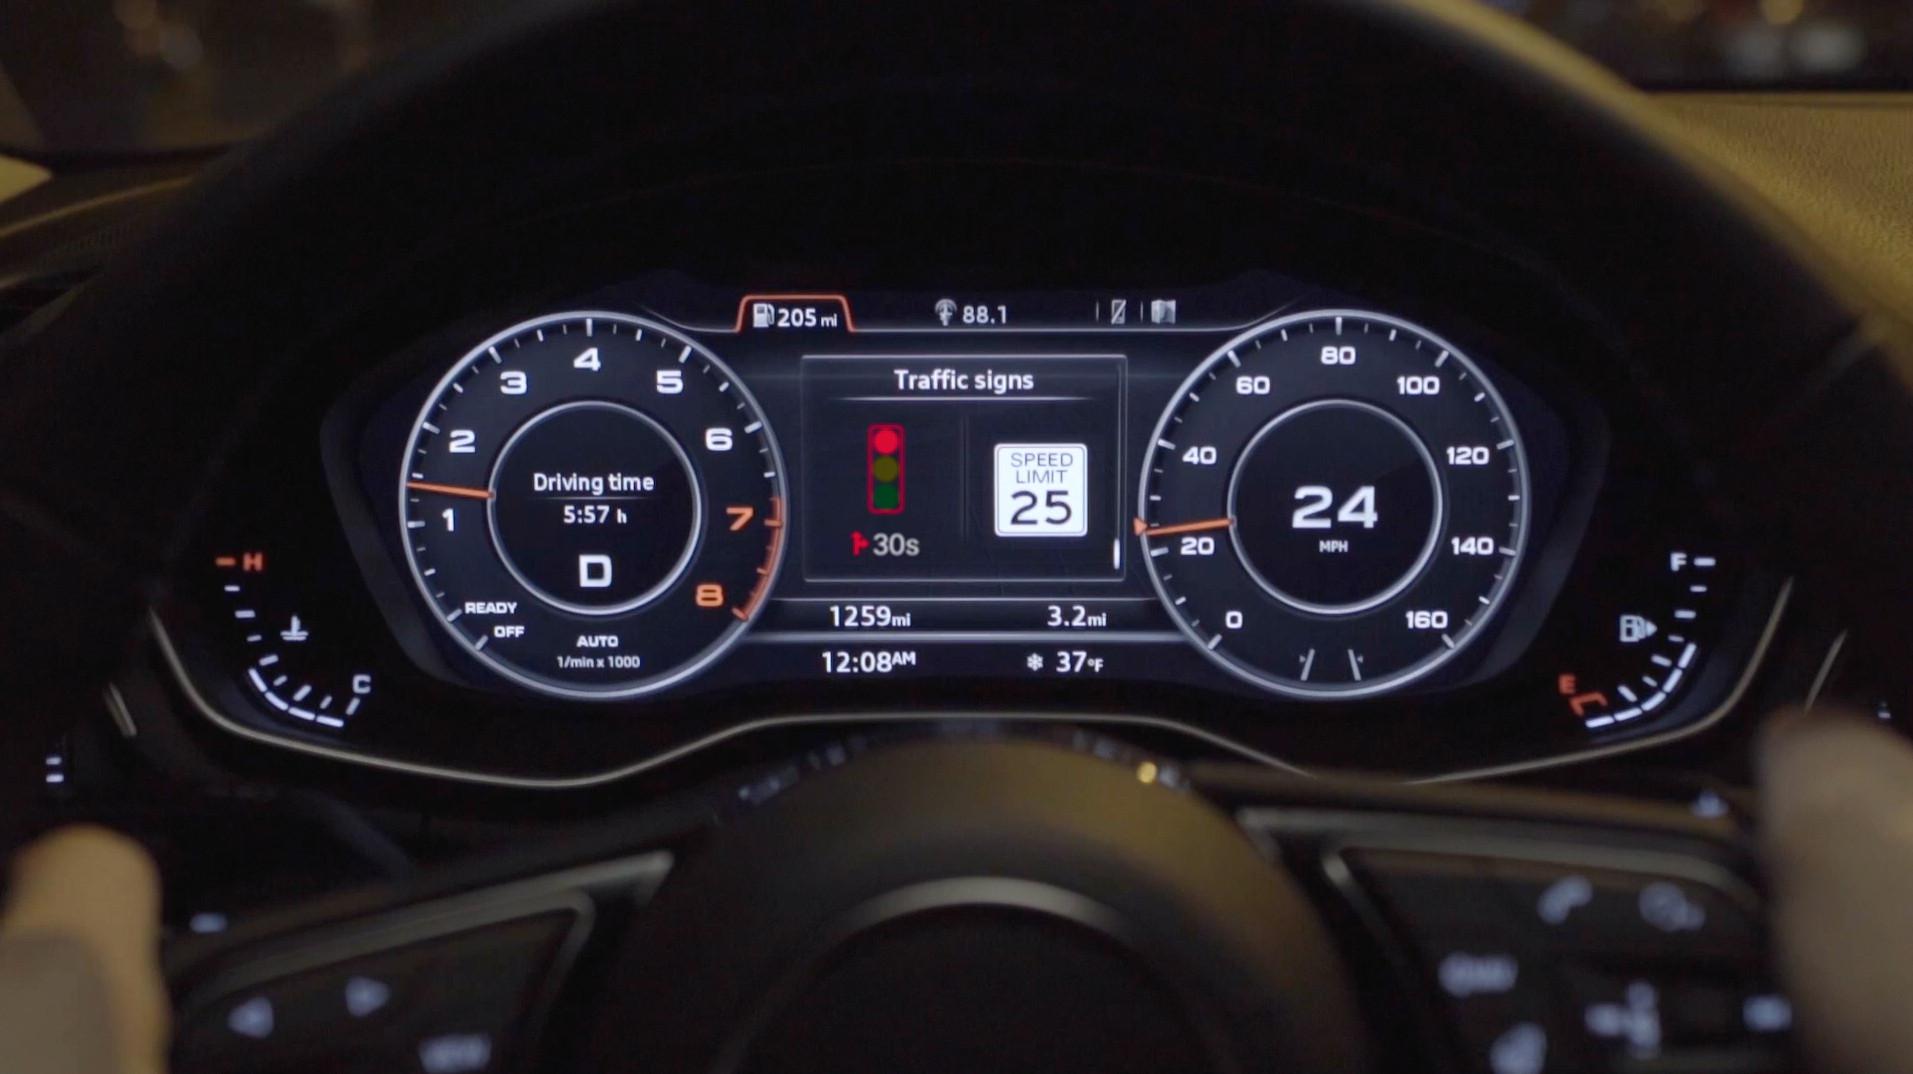 2020 Ford Explorer Hybrid, Bill Gates, GM e-bikes: Today's Car News